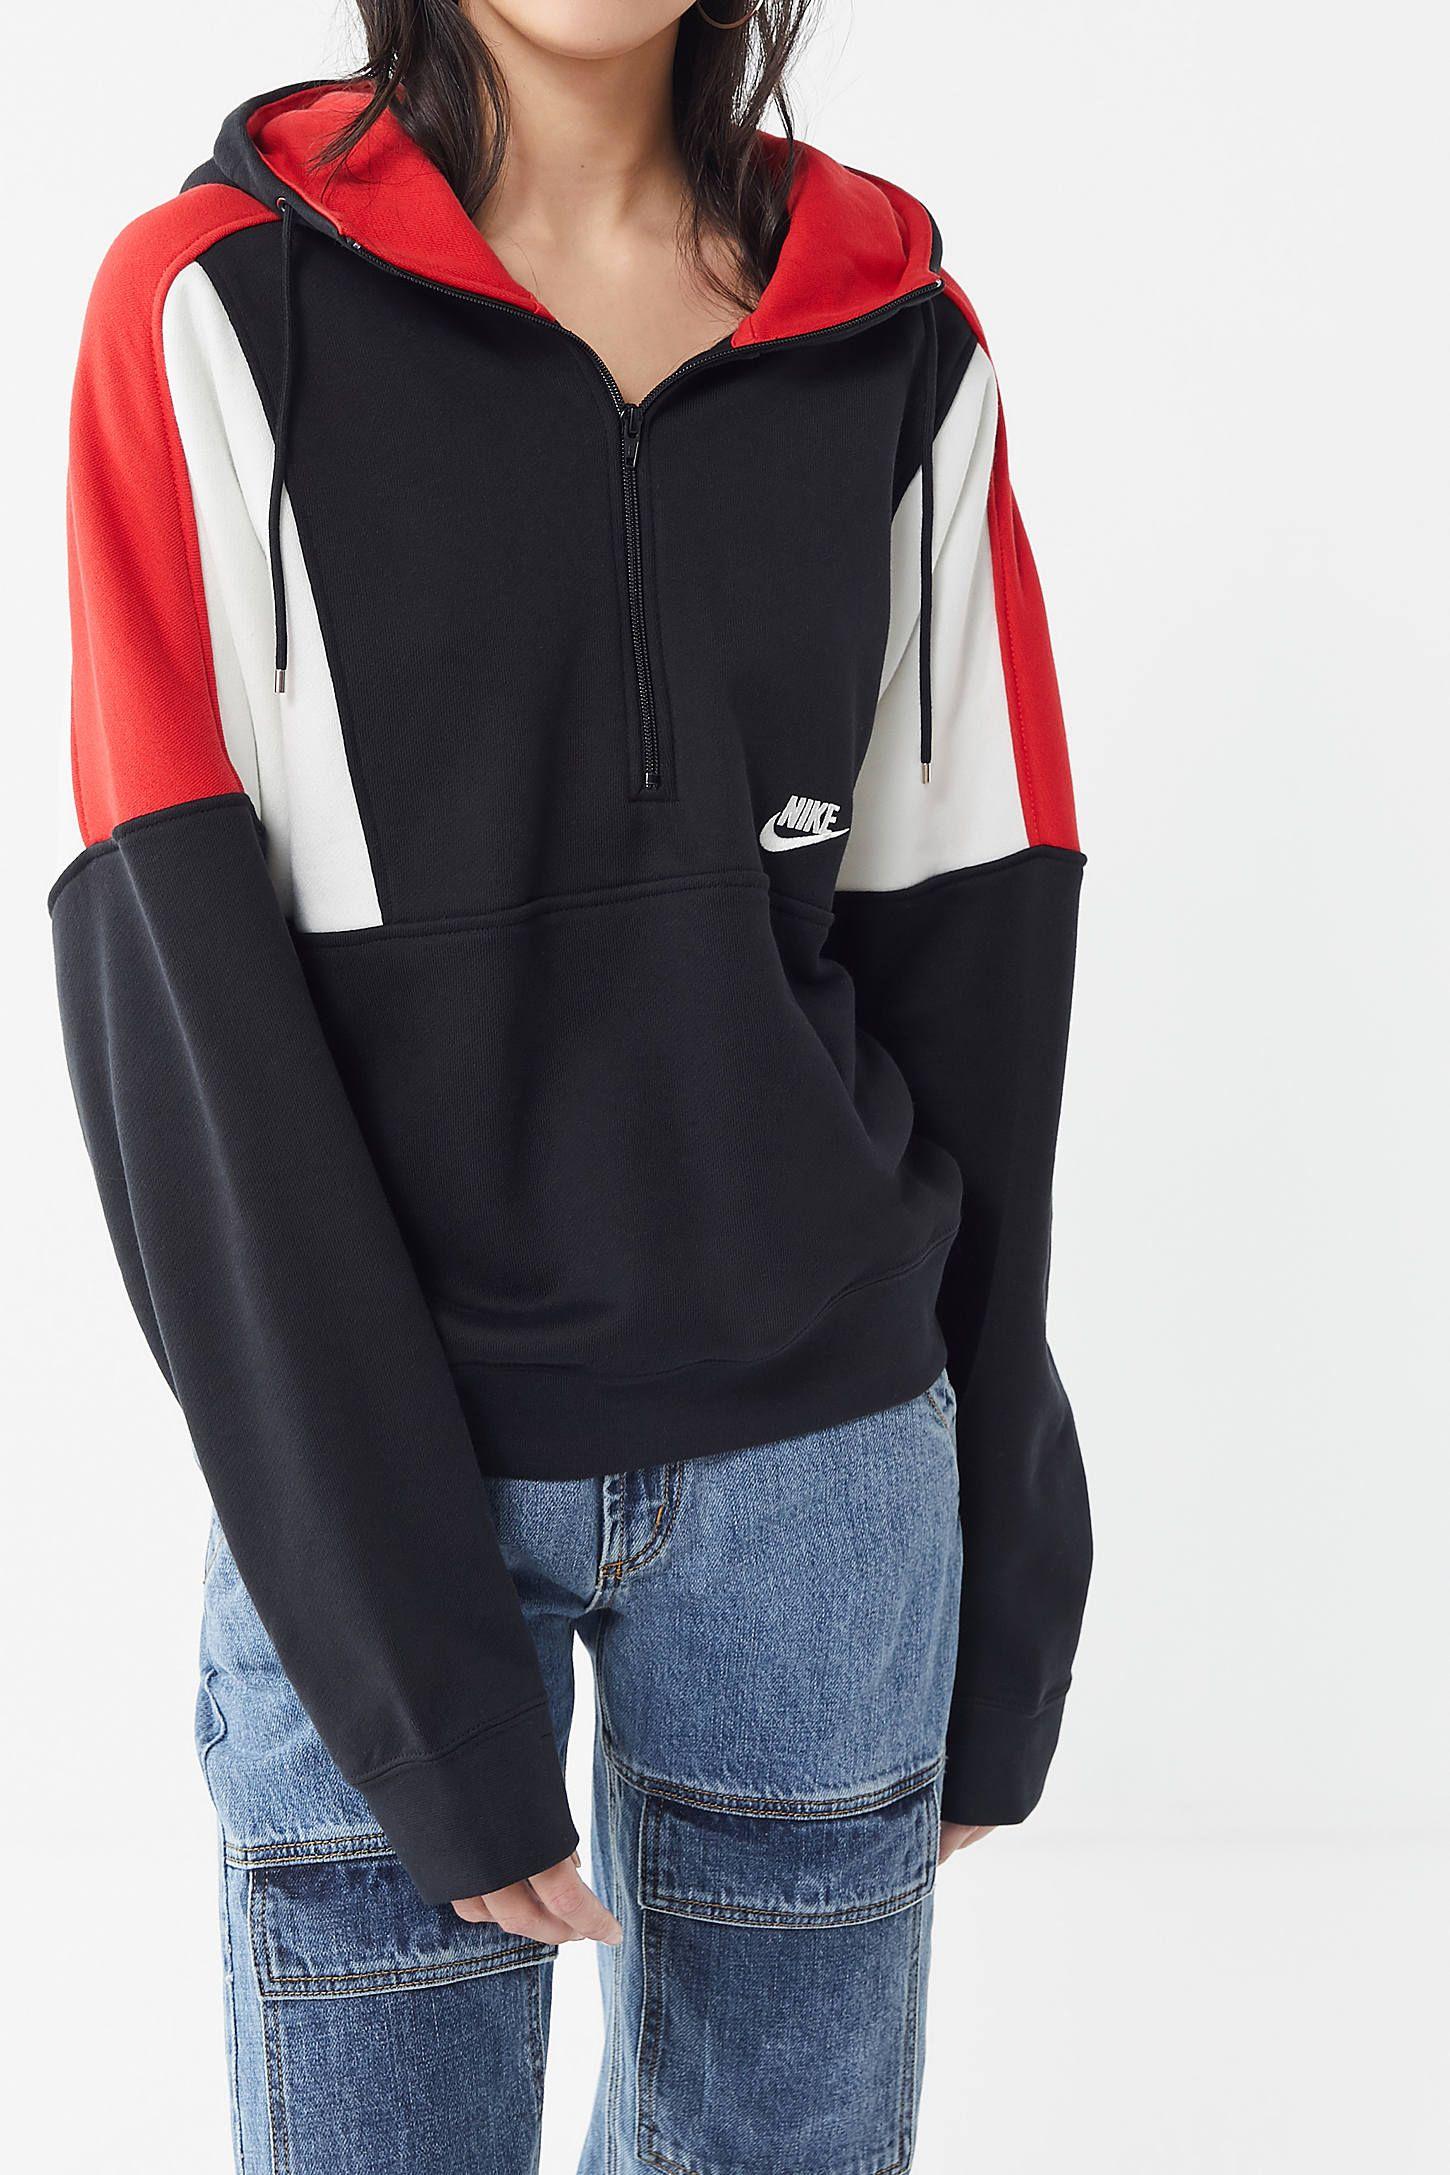 the best offer discounts best value Nike Hoodie Half Zip   Top Air Half Zip Fleece Obsidian ...